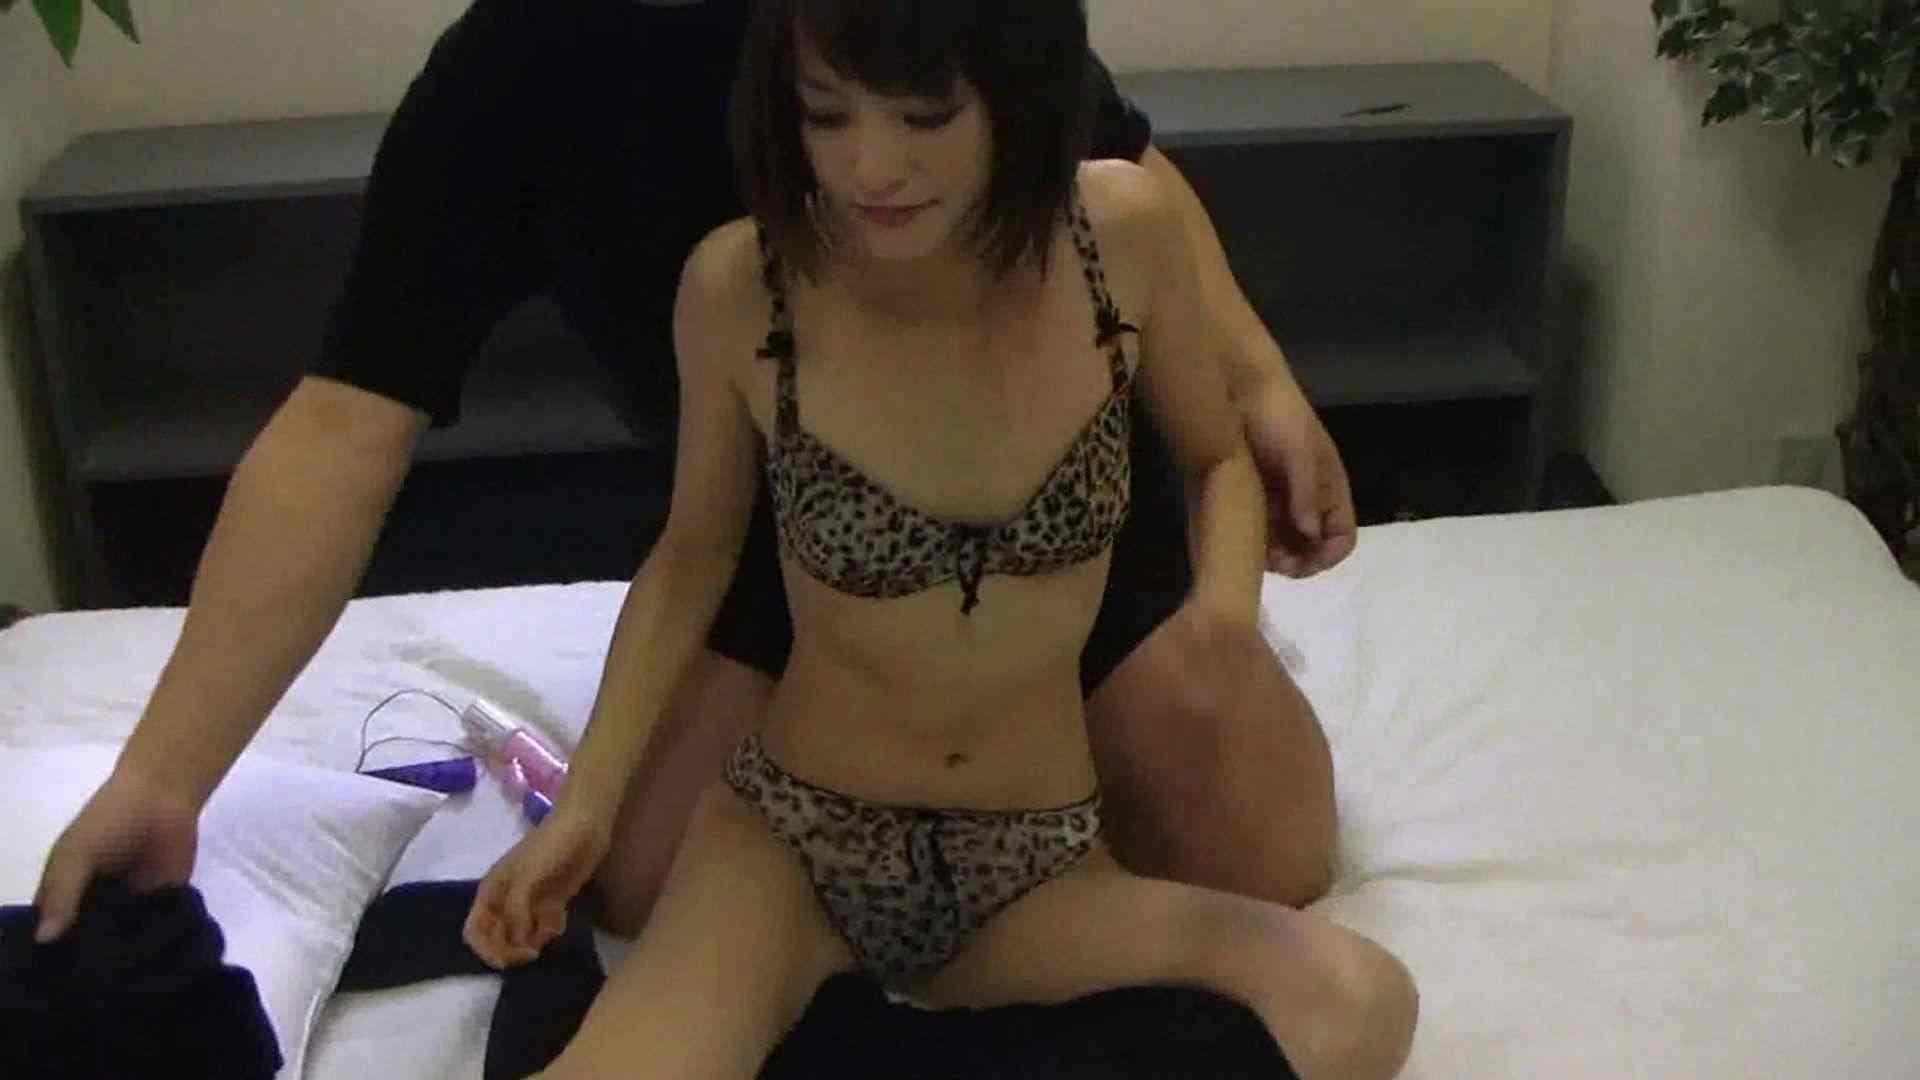 S級厳選美女ビッチガールVol.26 美女ヌード | OLセックス  72画像 29